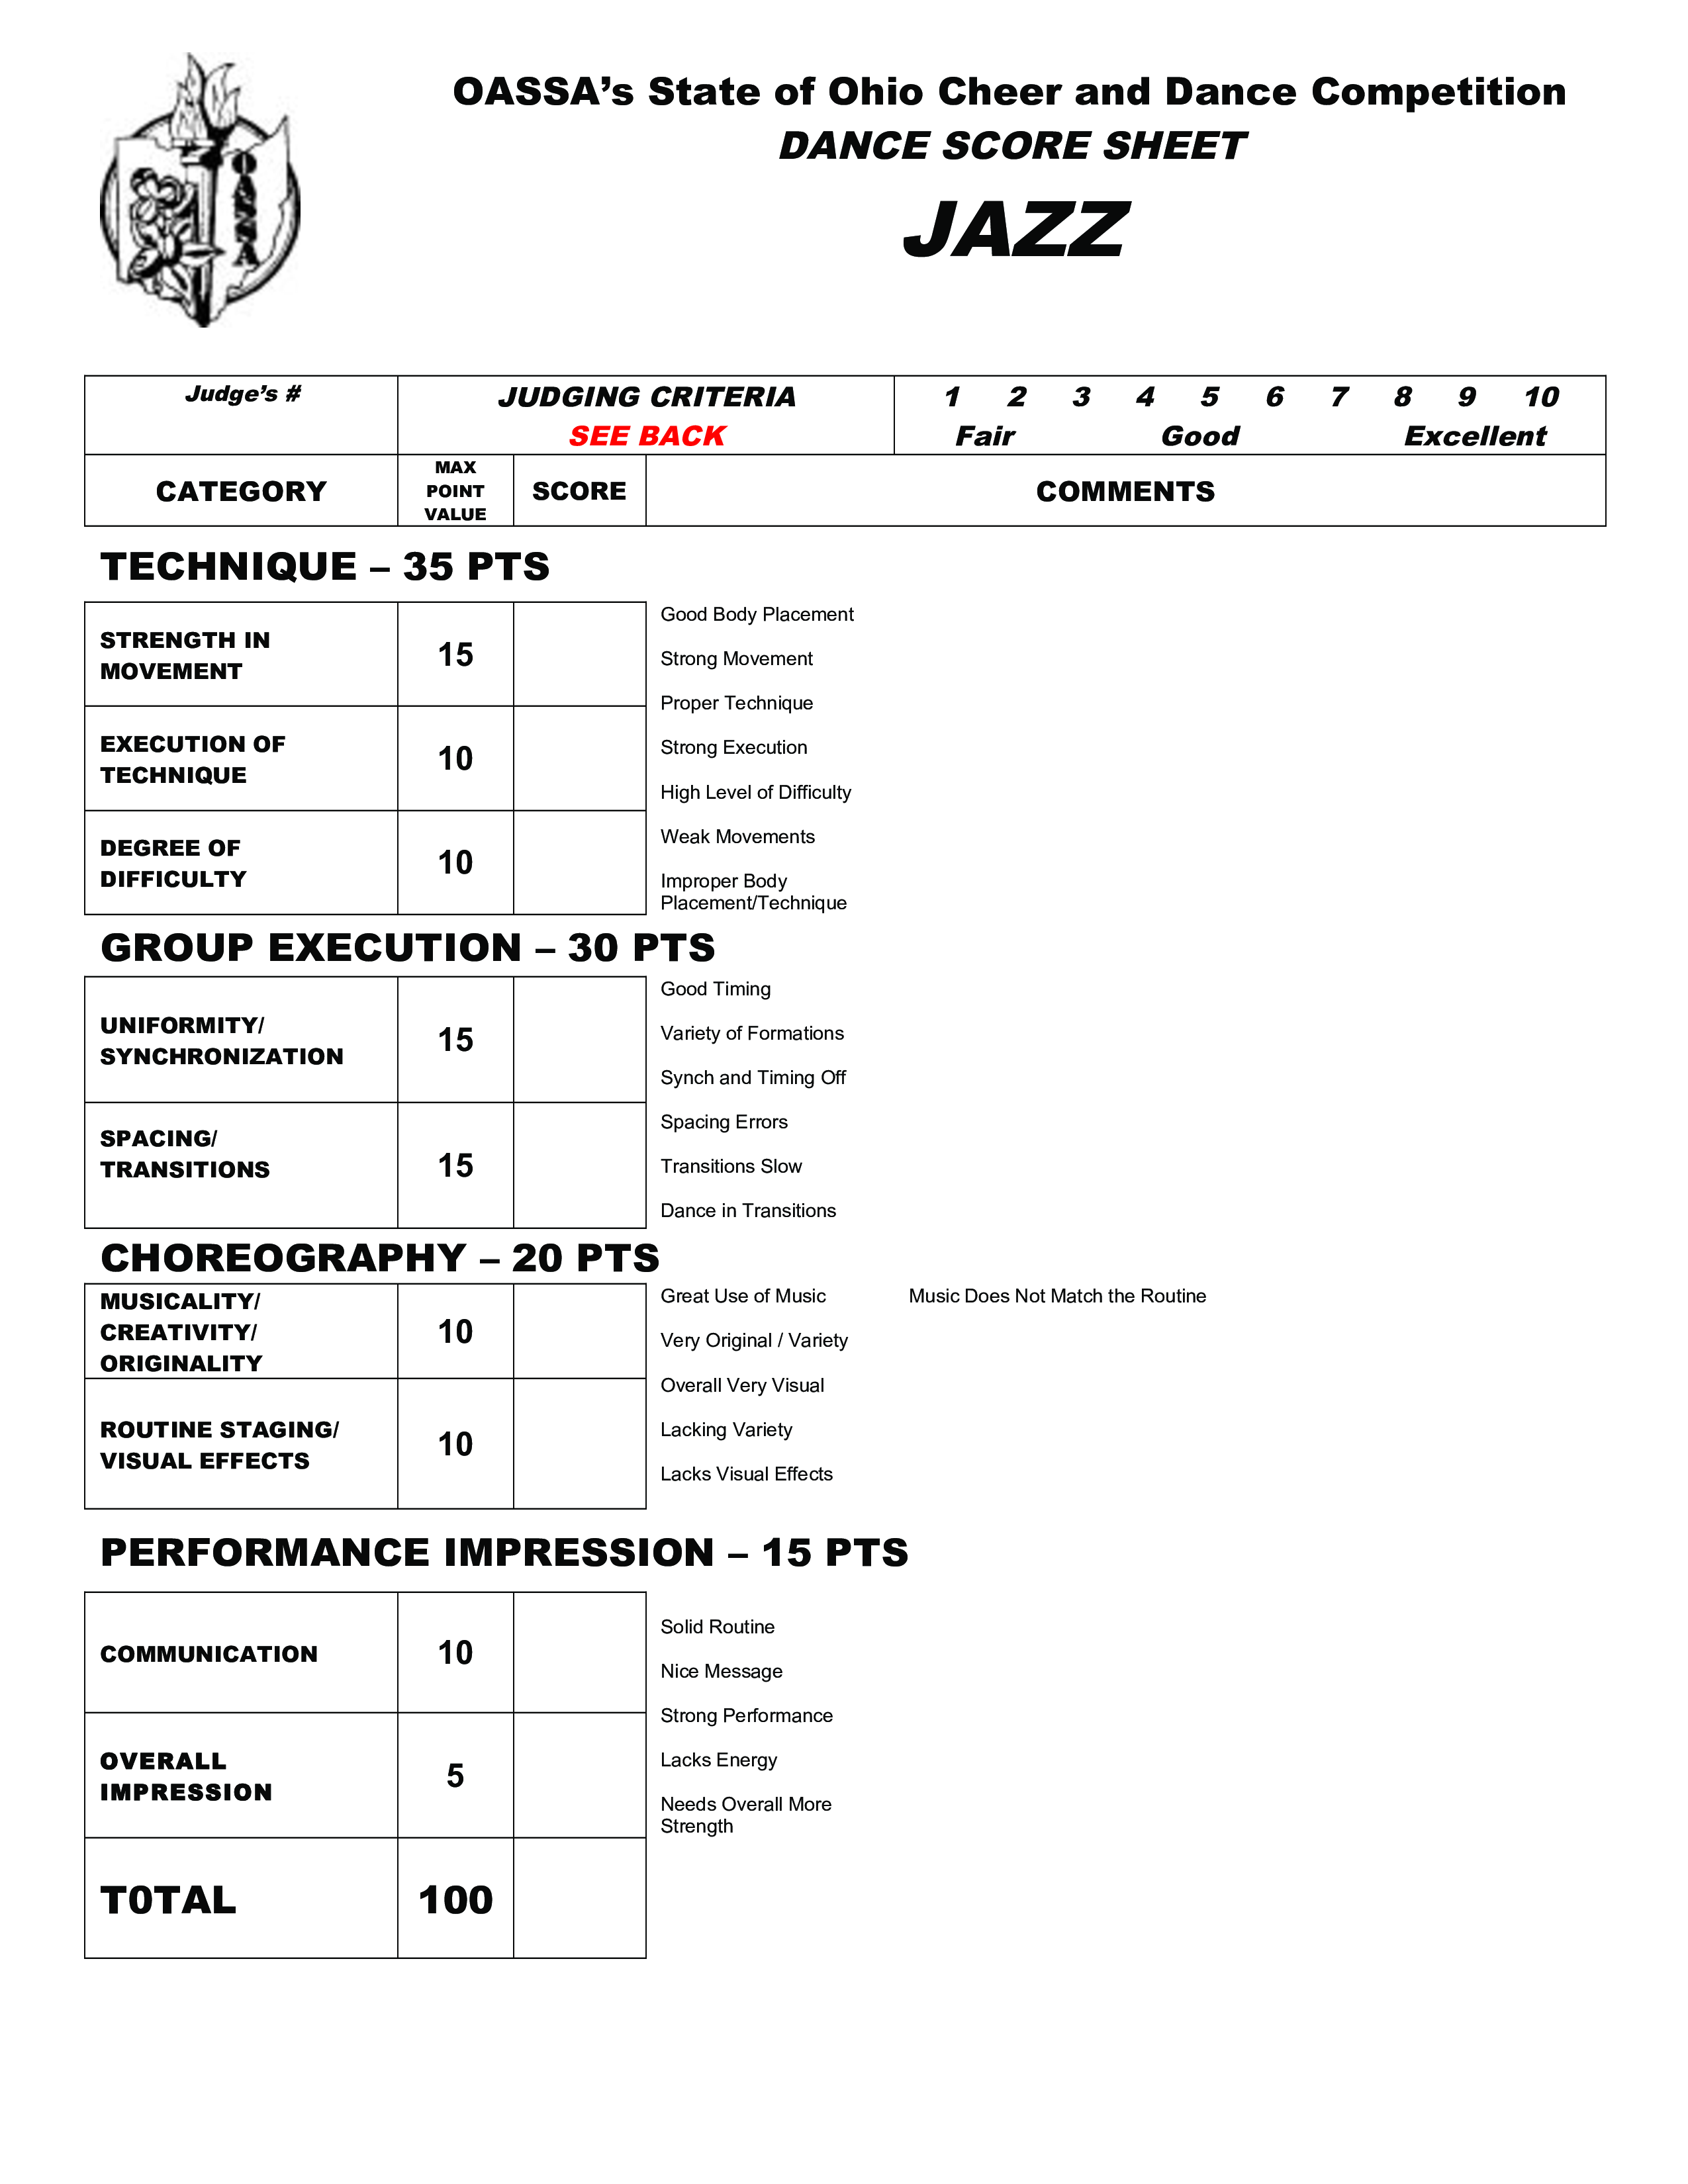 Dance Score Sheet Main Image Download Template